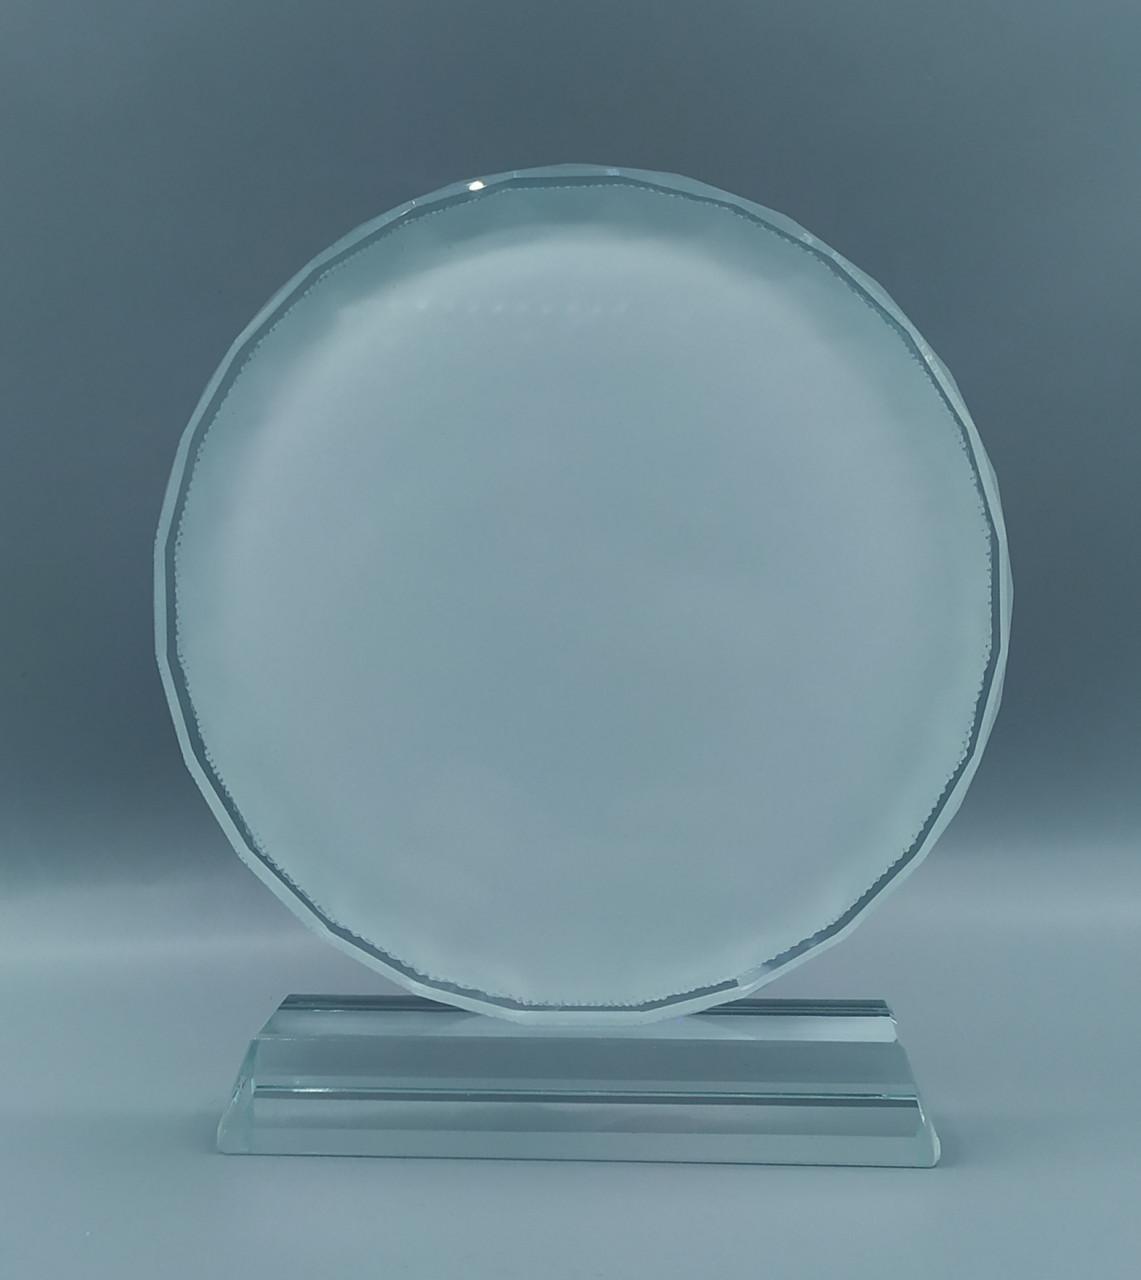 Фотокристалл для сублимации (BSJ 03а),размер - 145*145*15мм